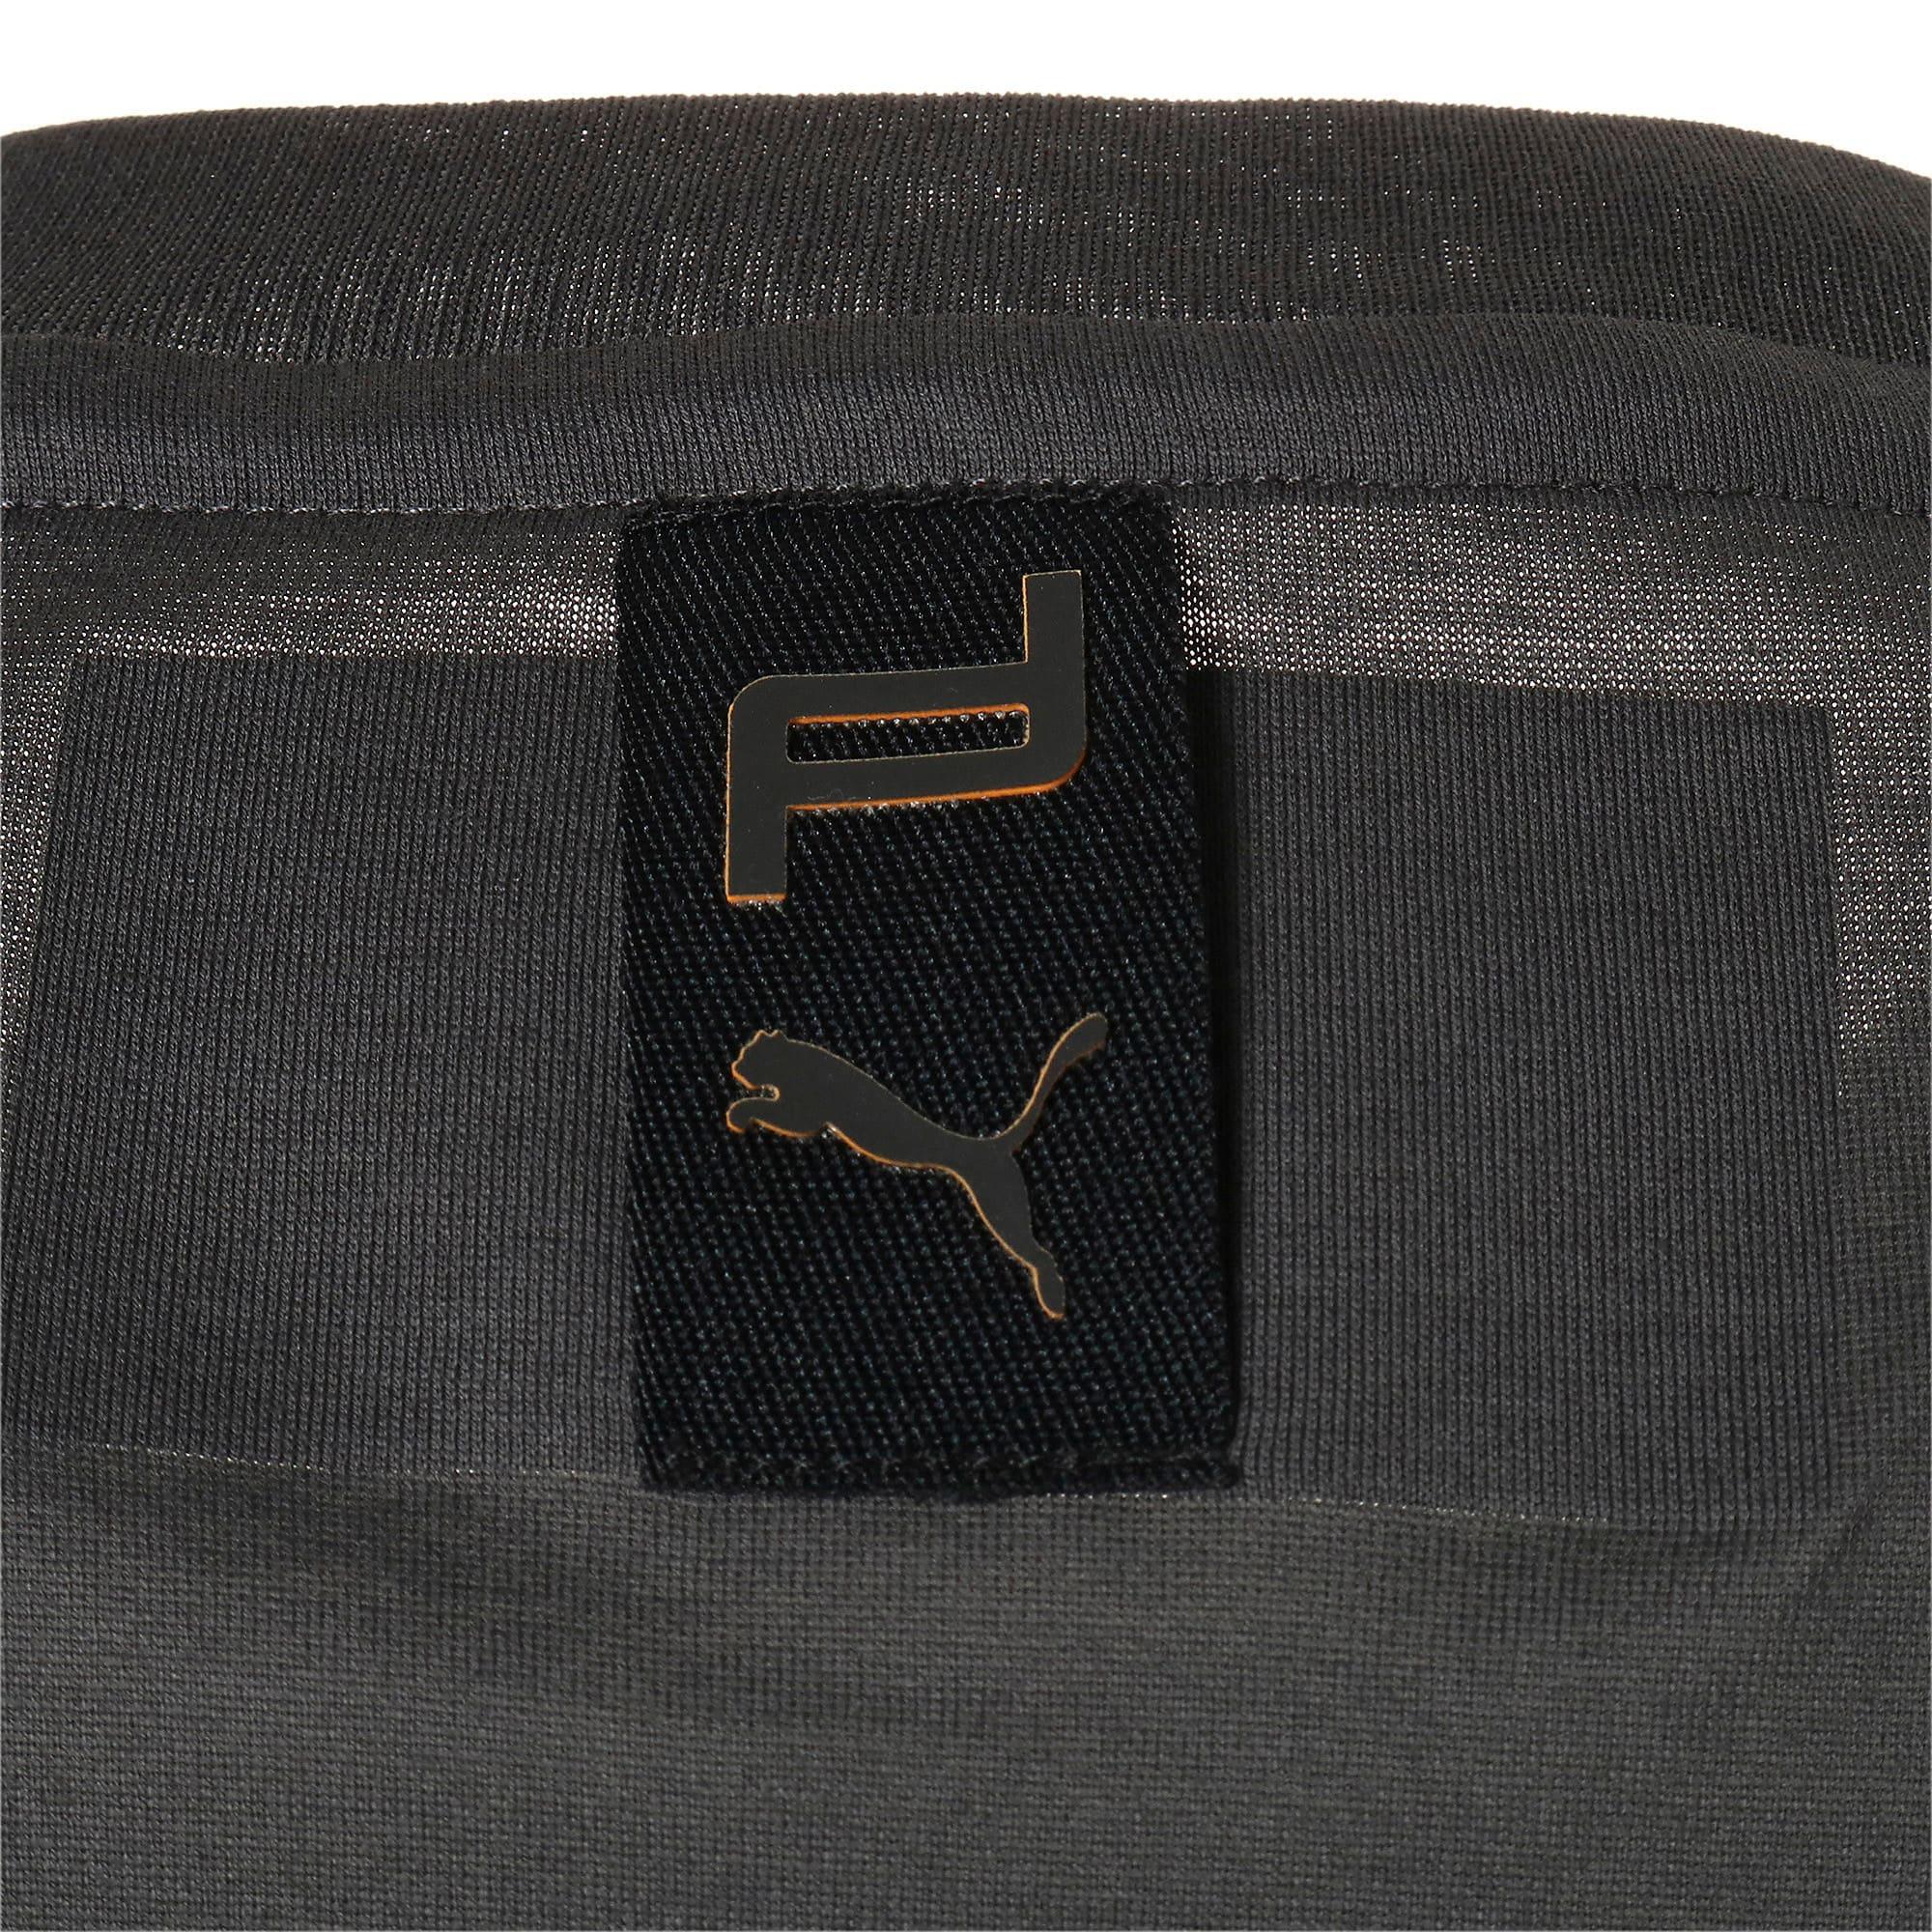 Thumbnail 8 of PORSCHE DESIGN  グラフィック Tシャツ, Asphalt, medium-JPN